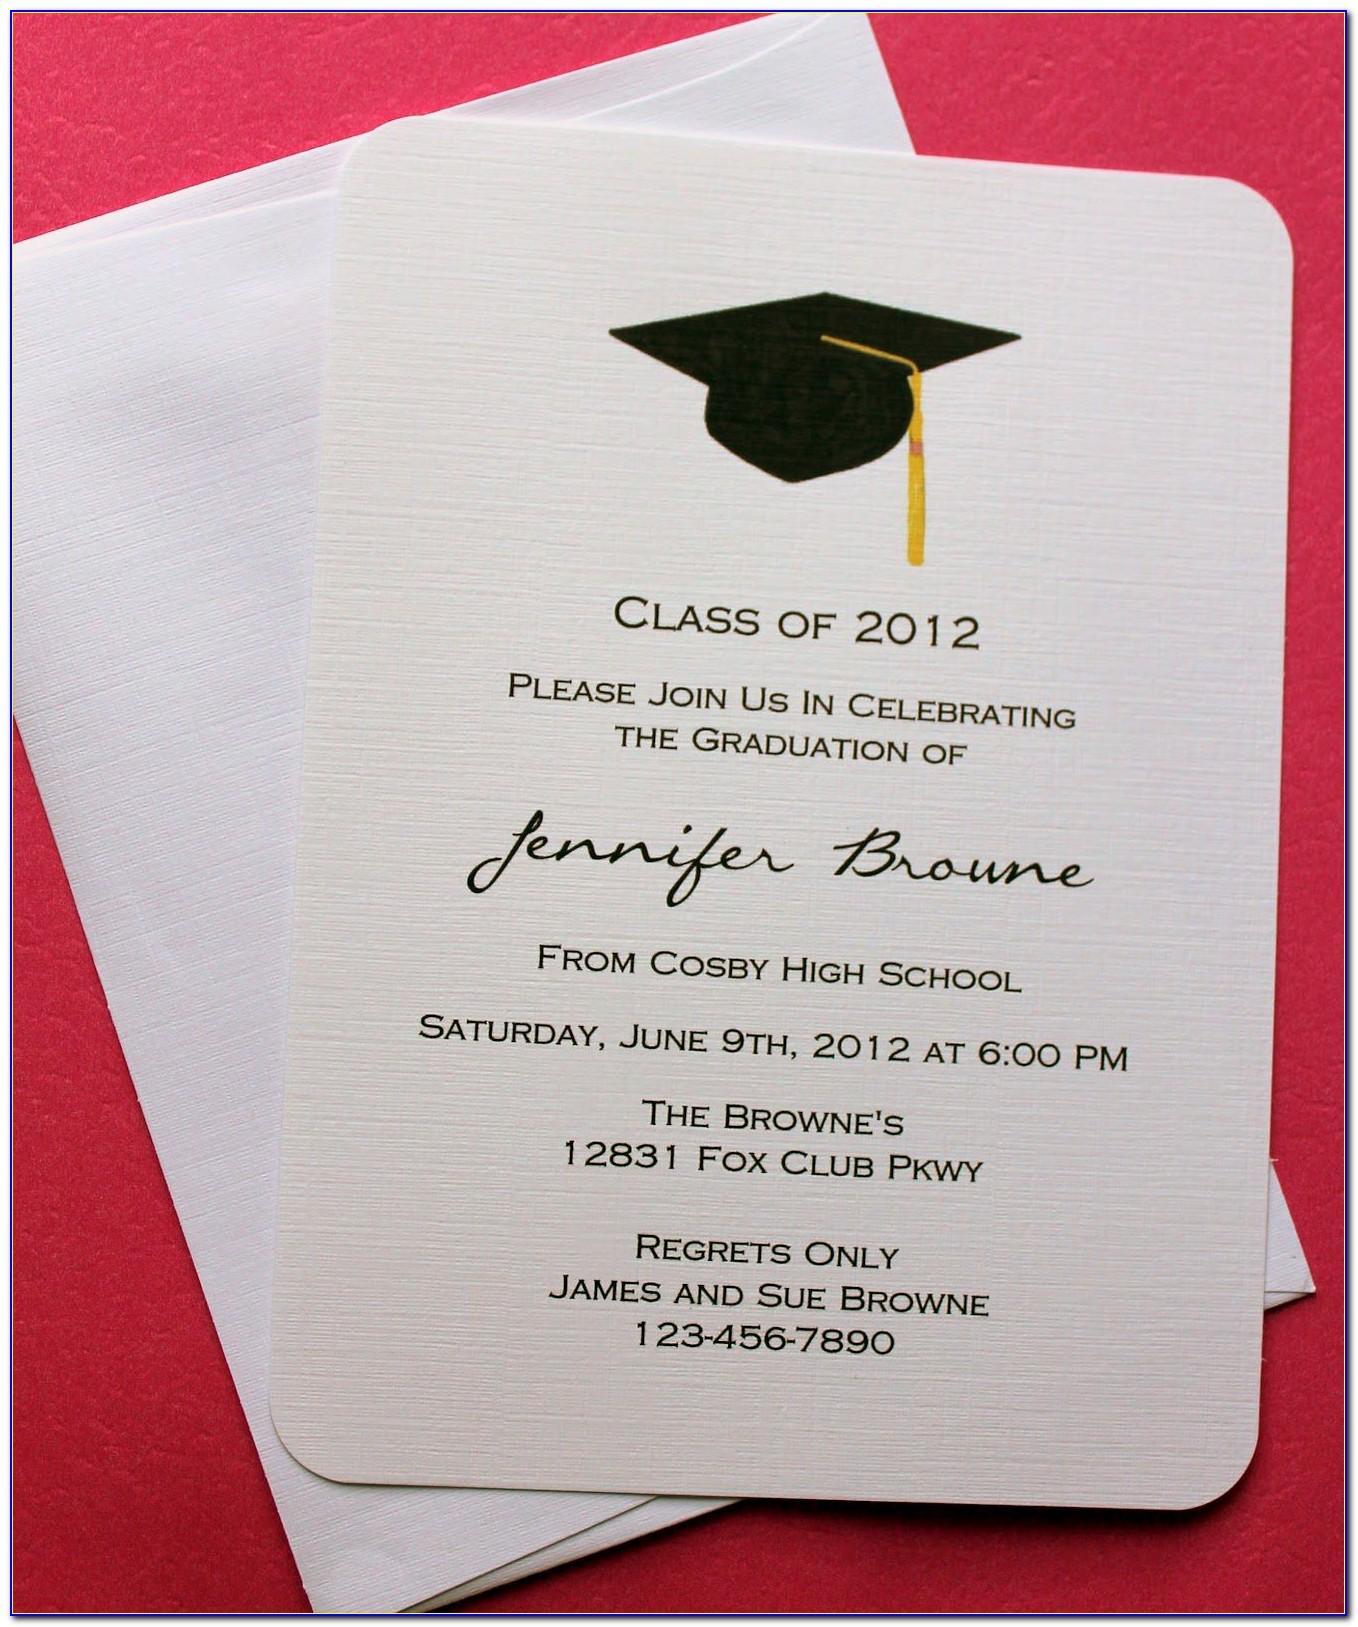 Graduation Ceremony Invitation Template Word